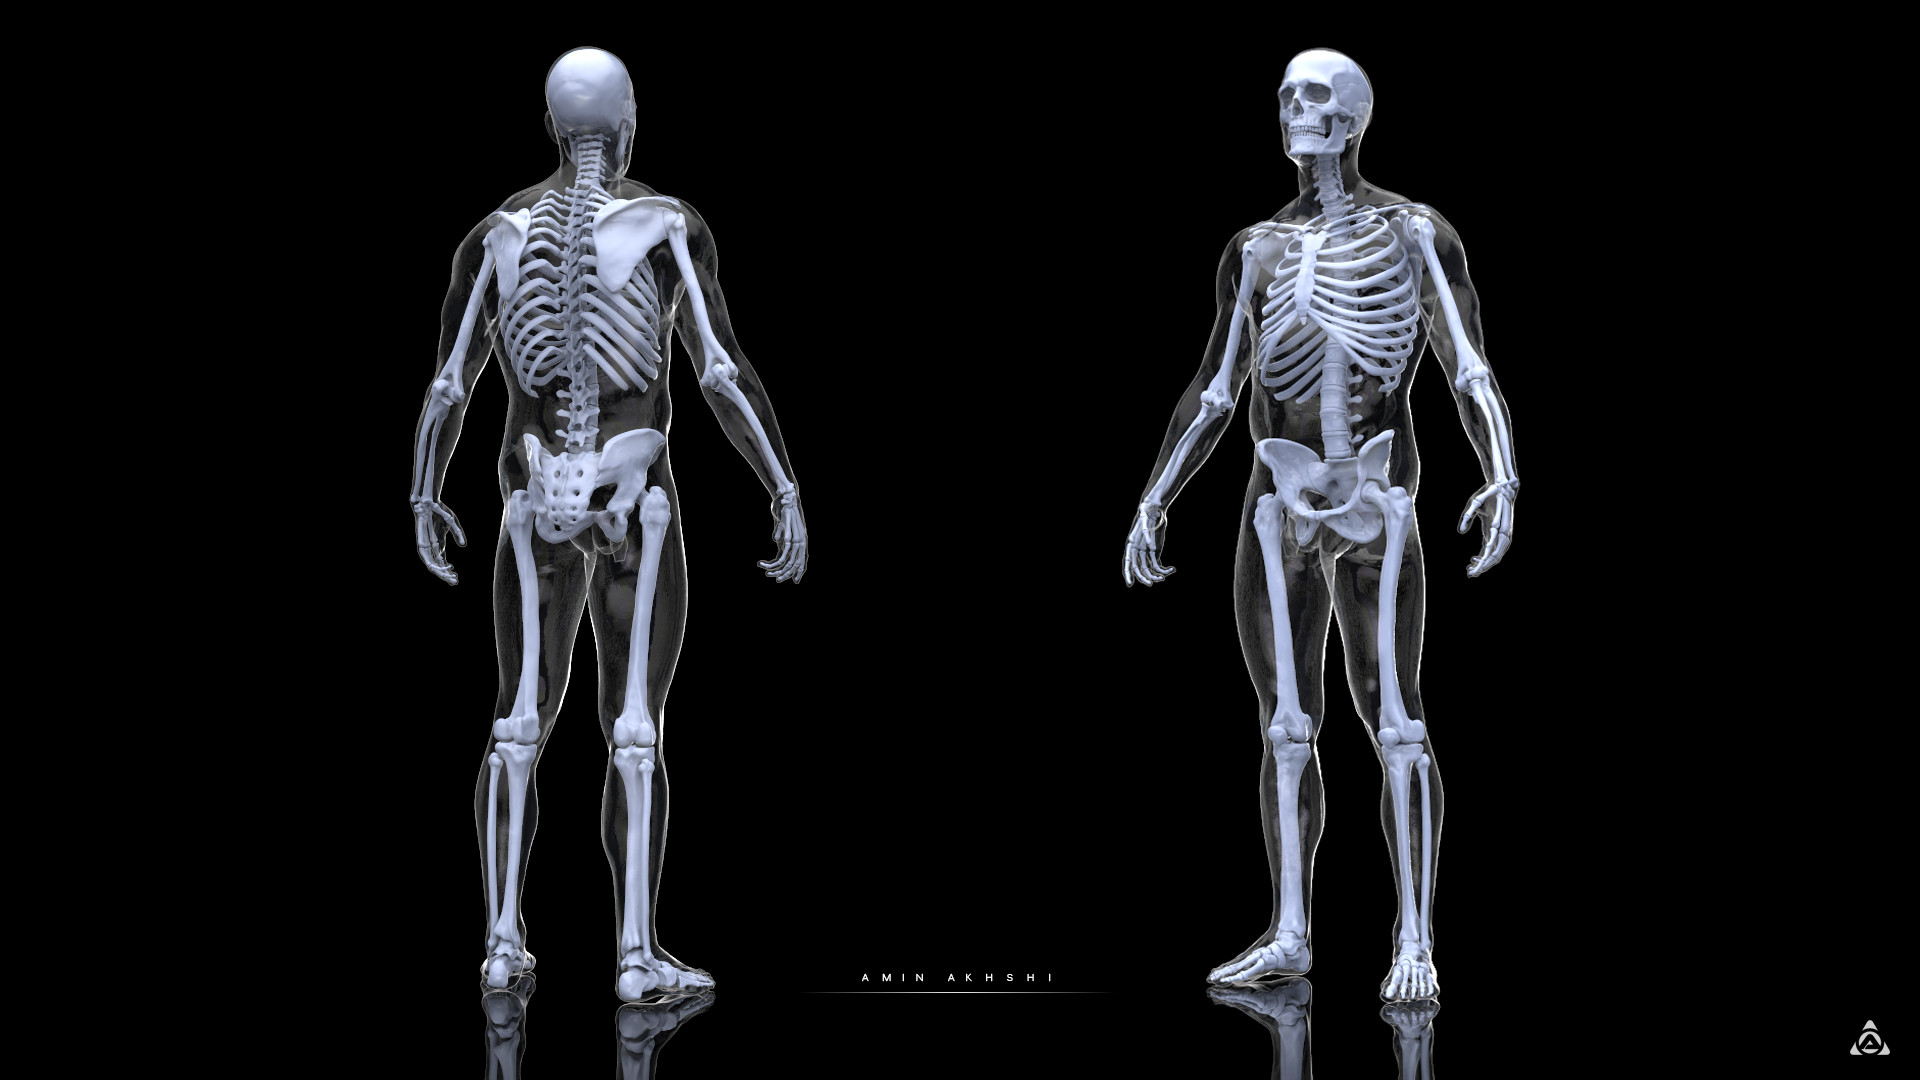 Amin akhshi anatomy study human skeleton